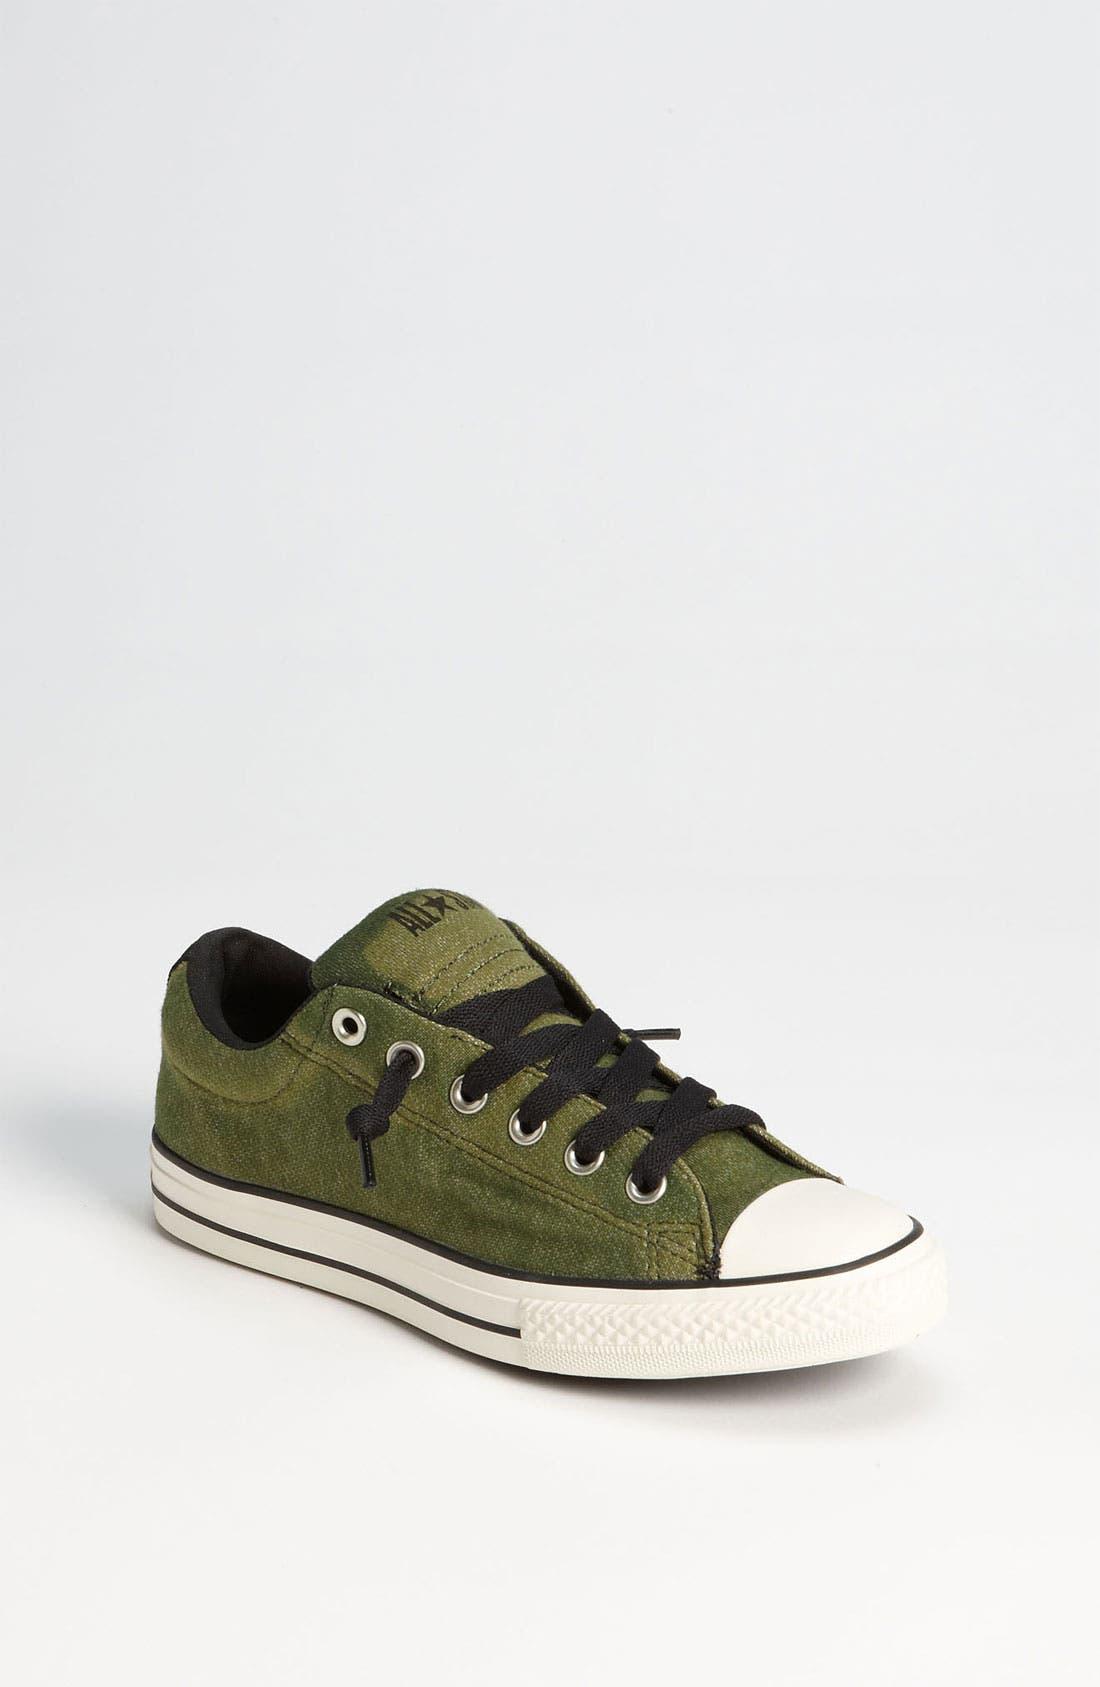 Alternate Image 1 Selected - Converse Chuck Taylor® 'Street' Sneaker (Toddler, Little Kid & Big Kid)